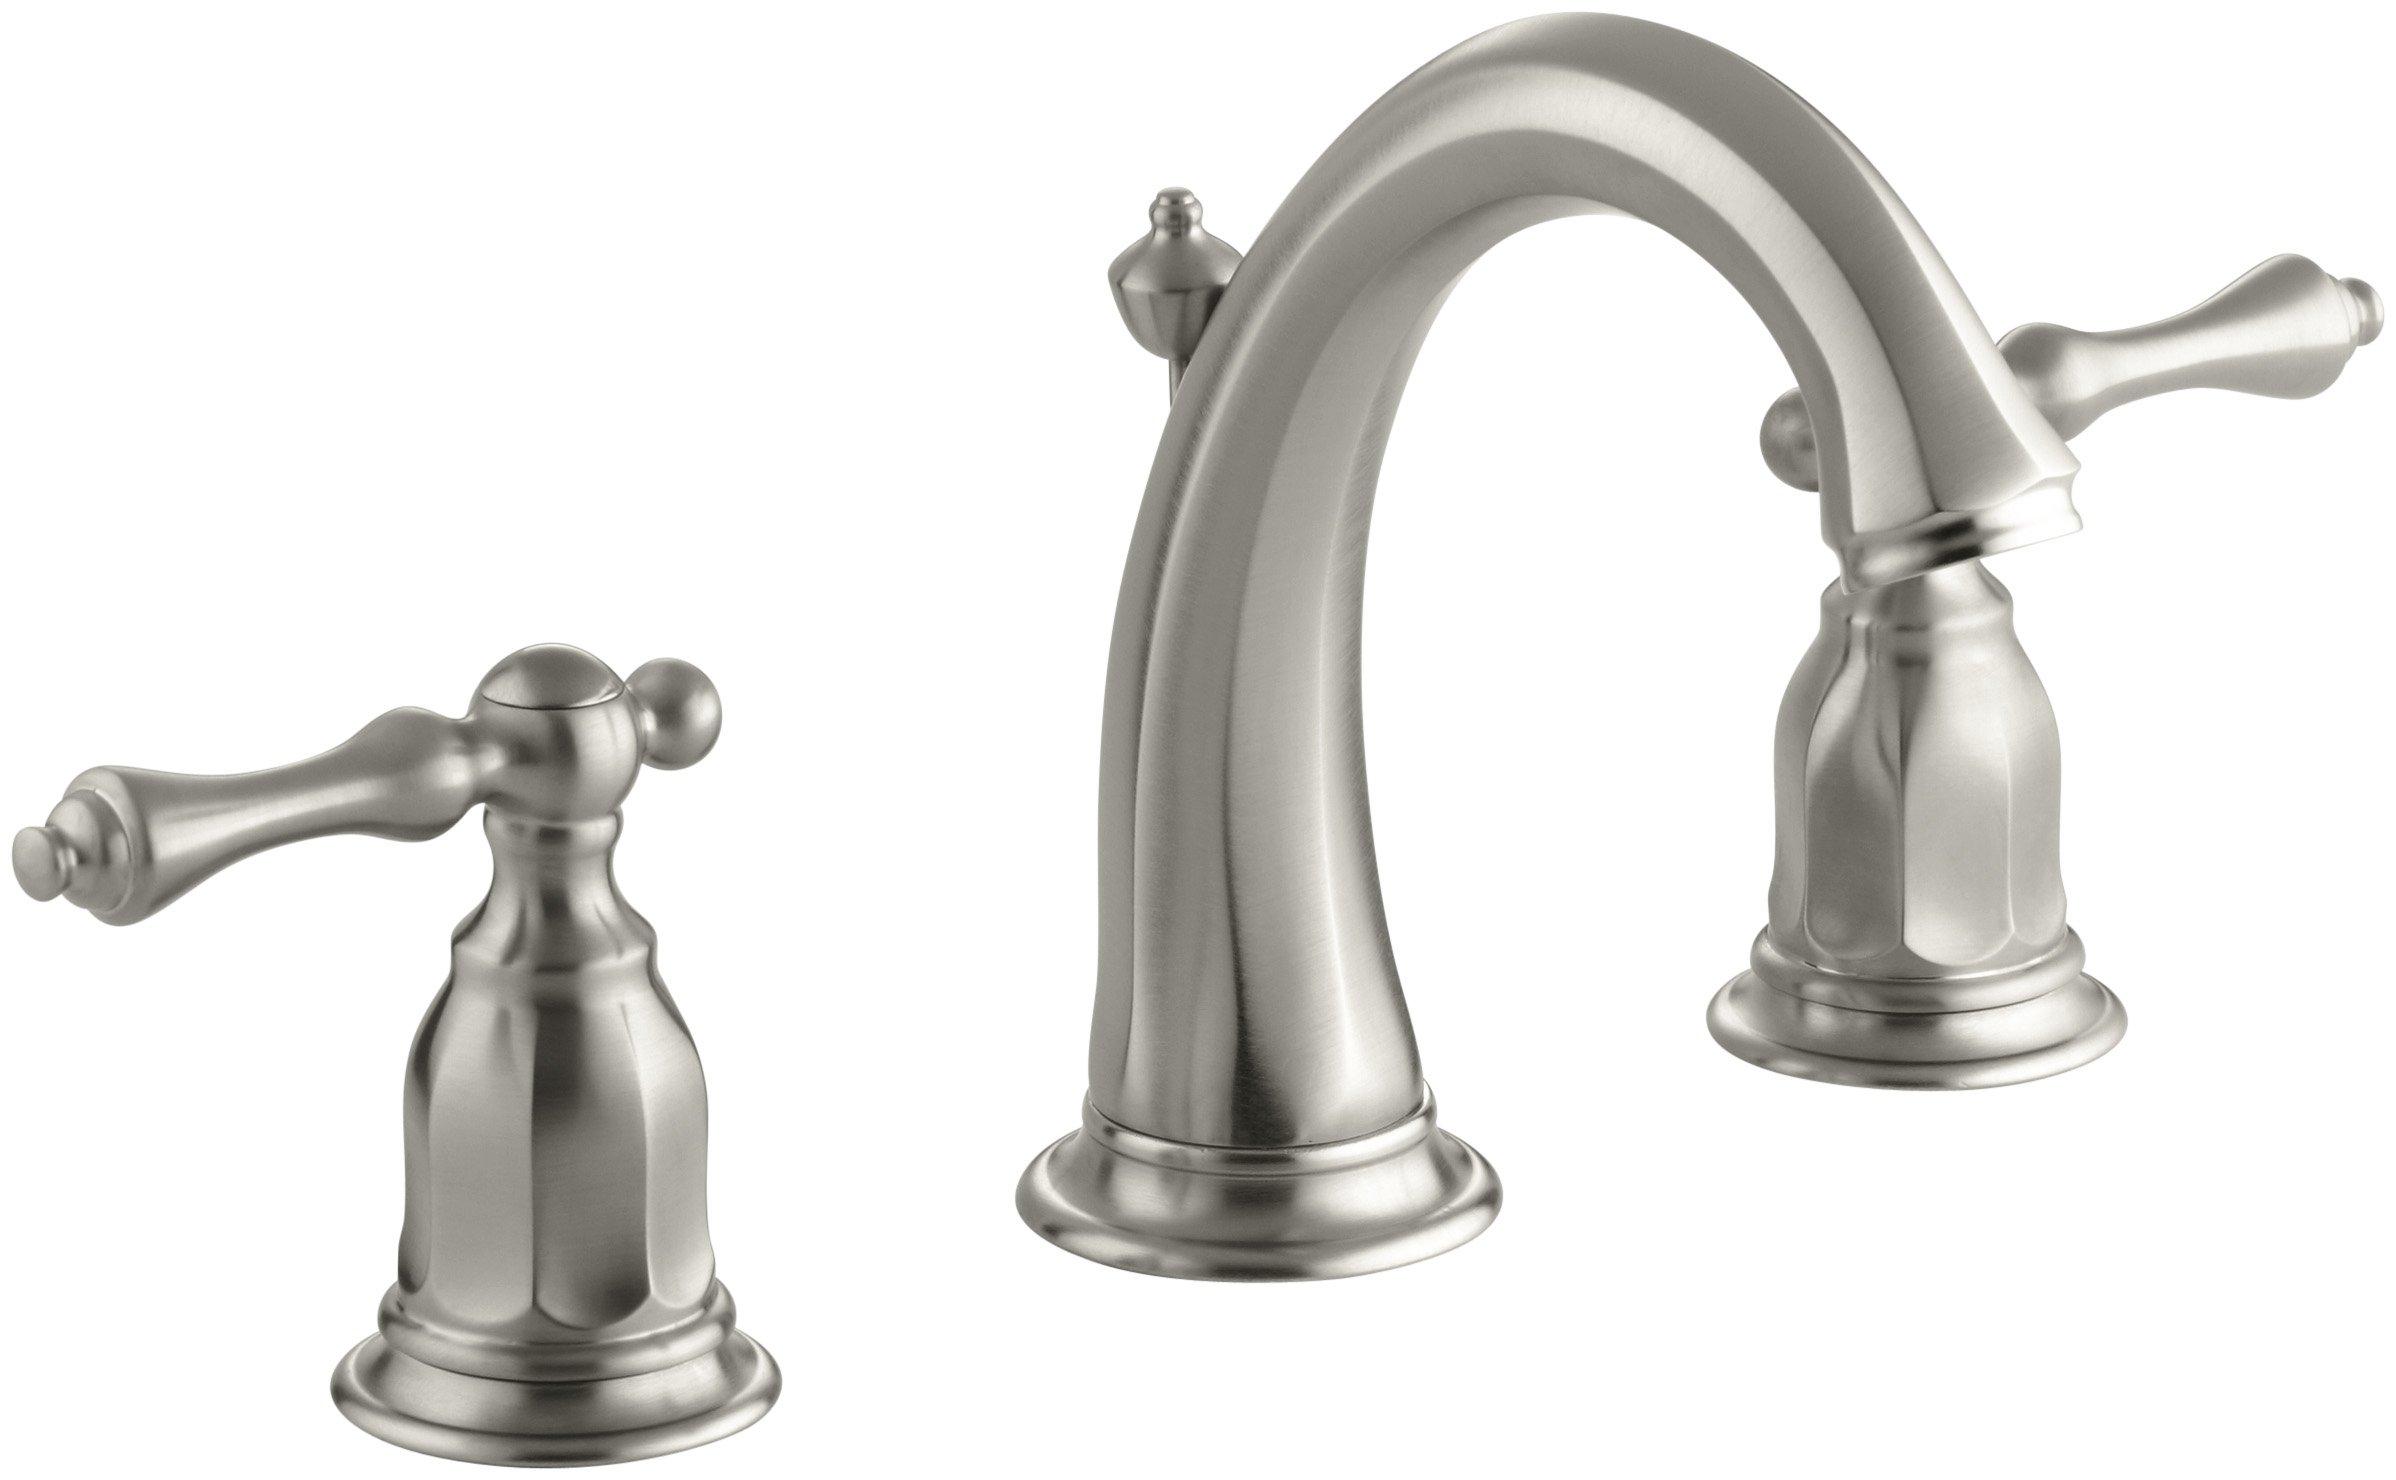 KOHLER K-13491-4-BN Kelston Widespread Bathroom Sink Faucet, Vibrant Brushed Nickel